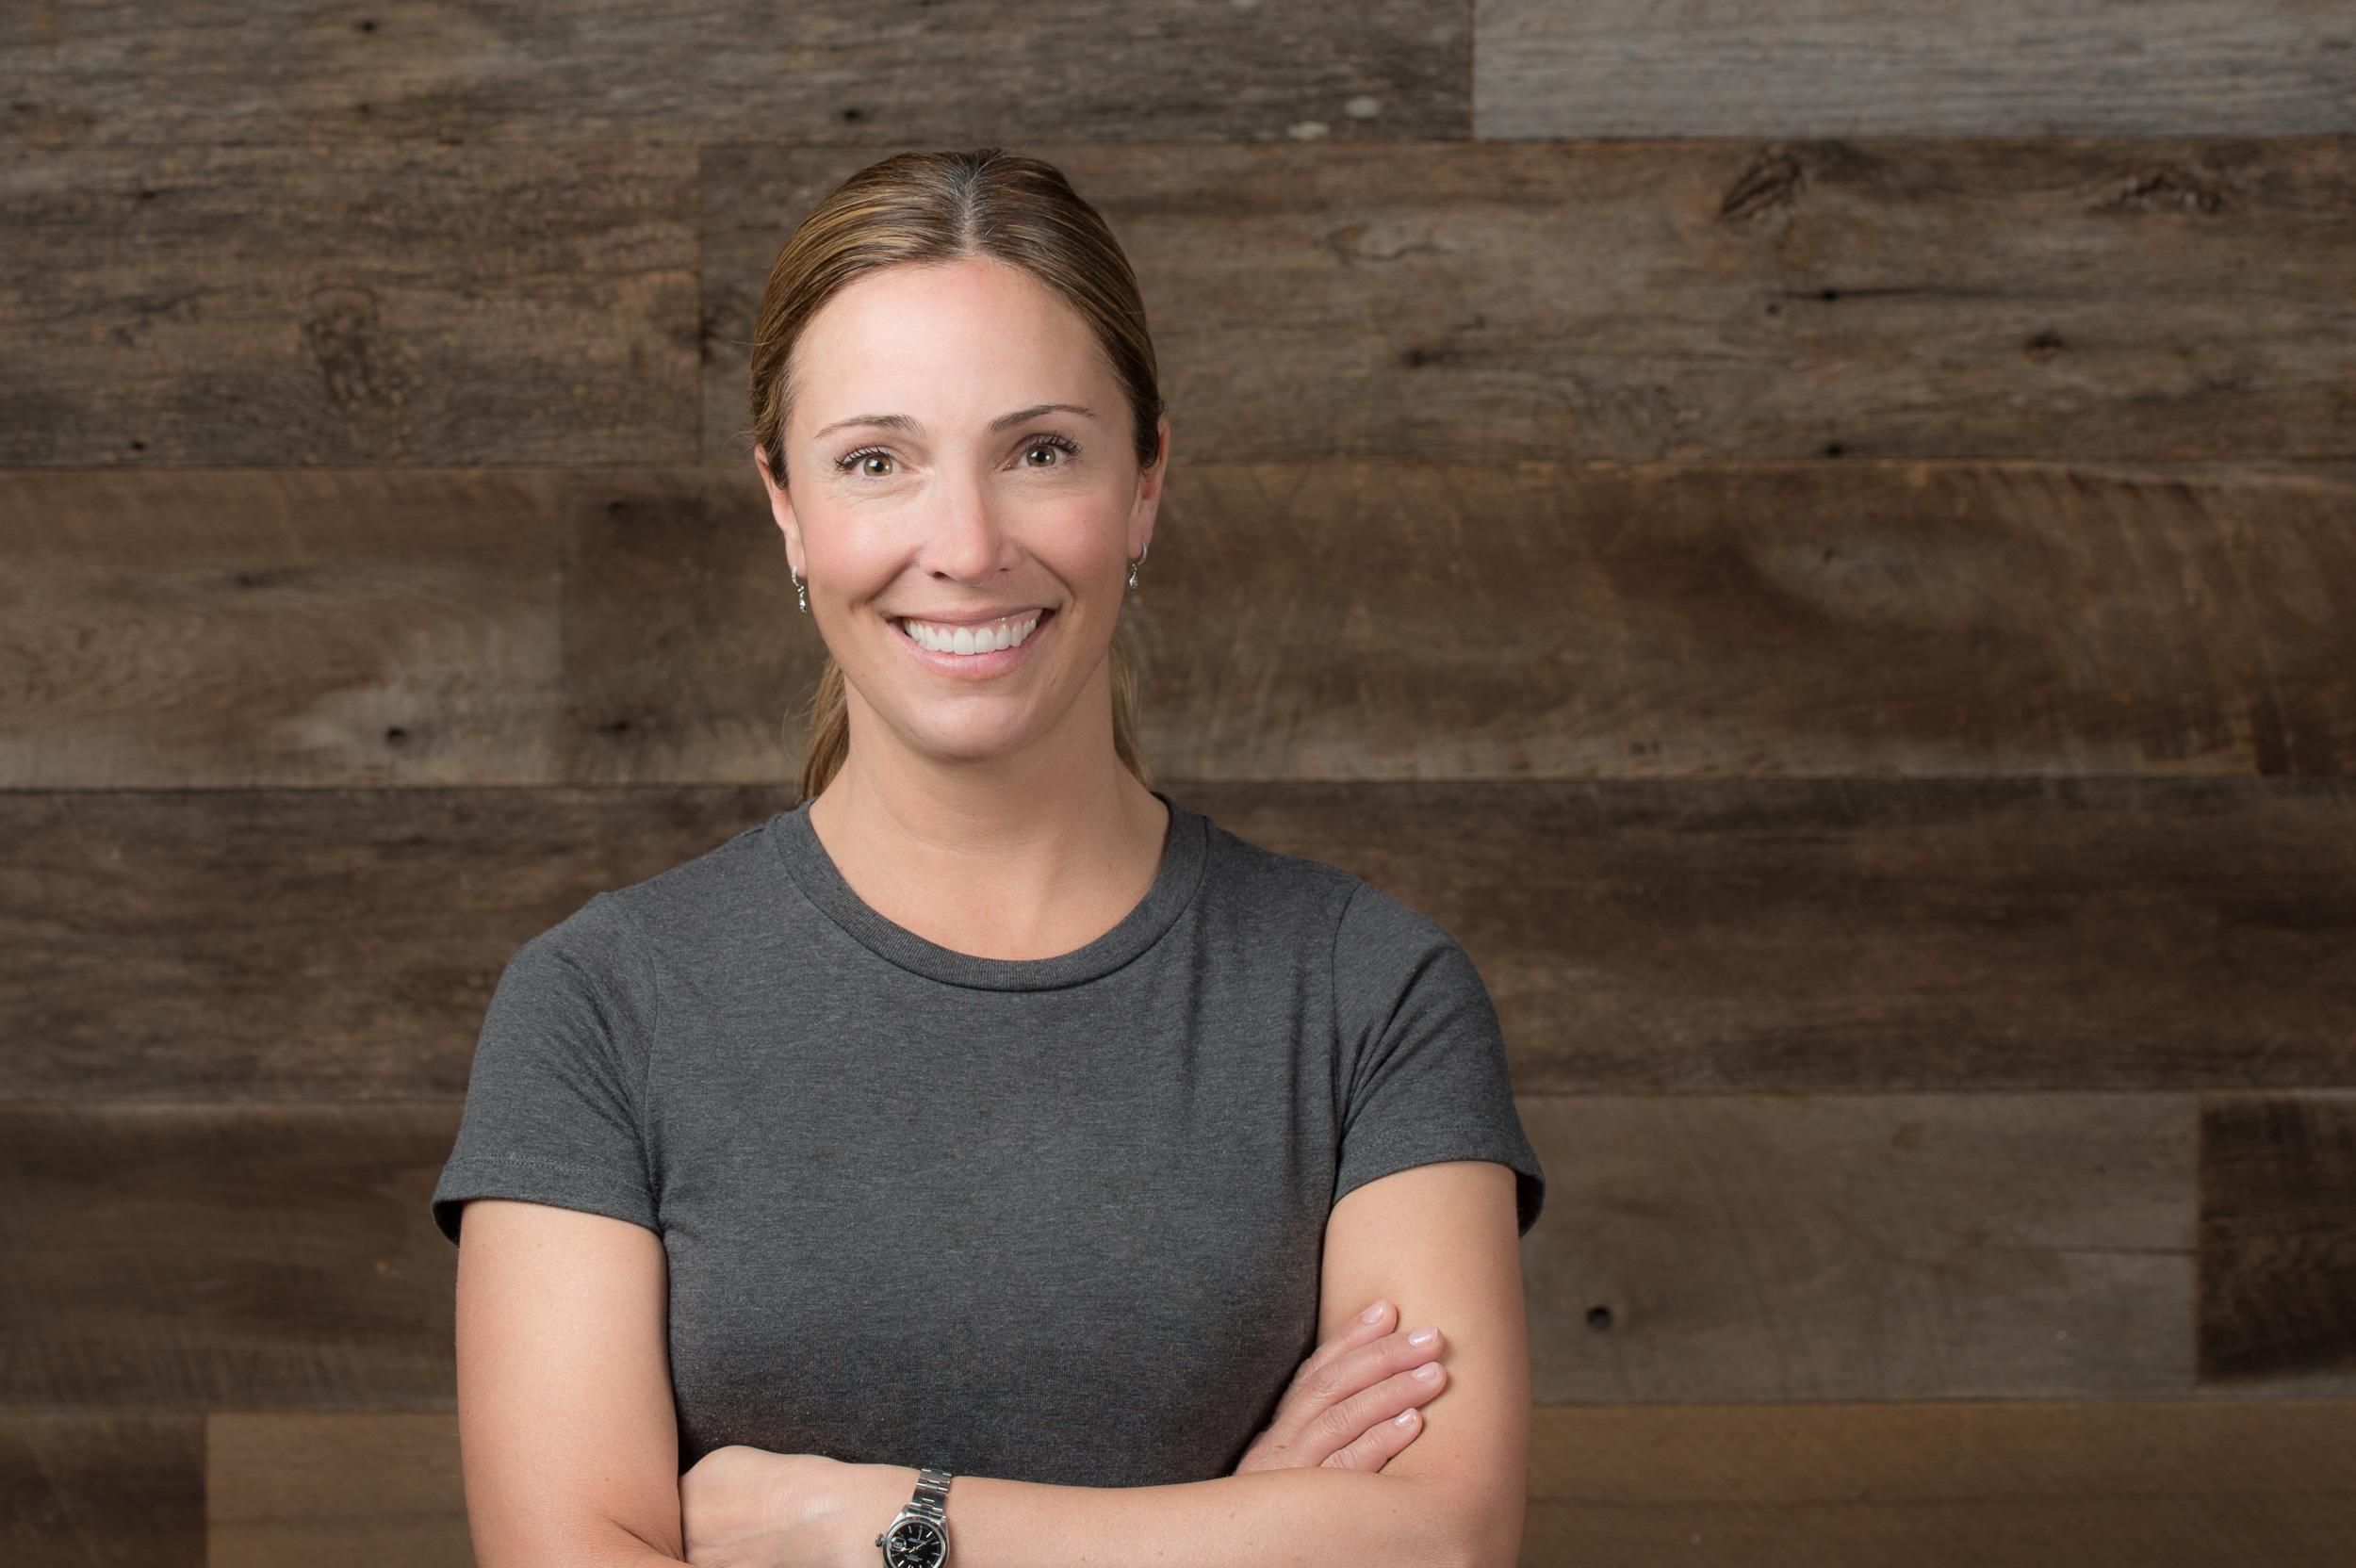 Jill Layfield, Co-Founder, Tamara Mellon